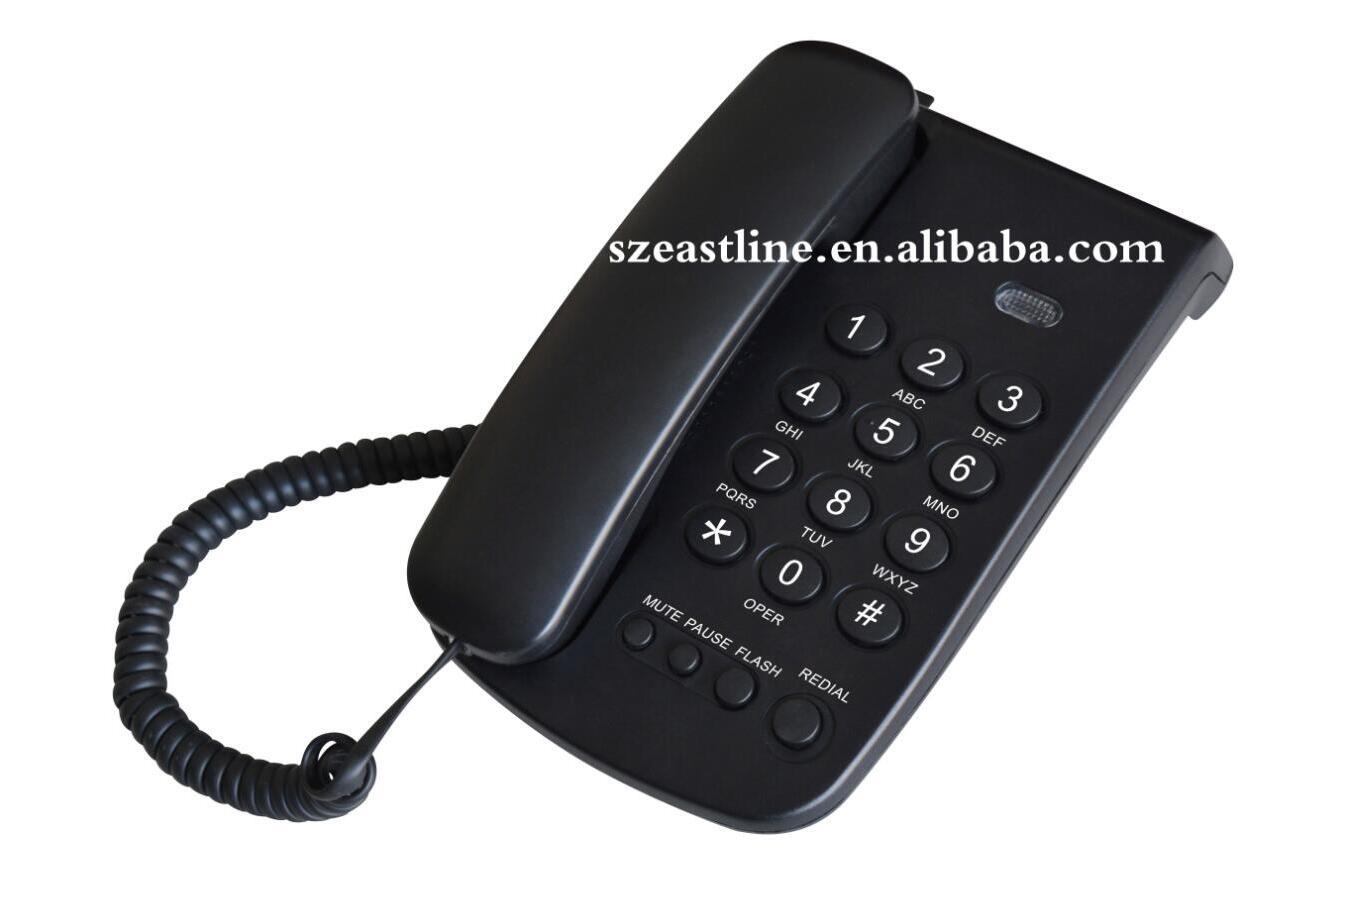 Basic Corded Telephone Set with Pulse